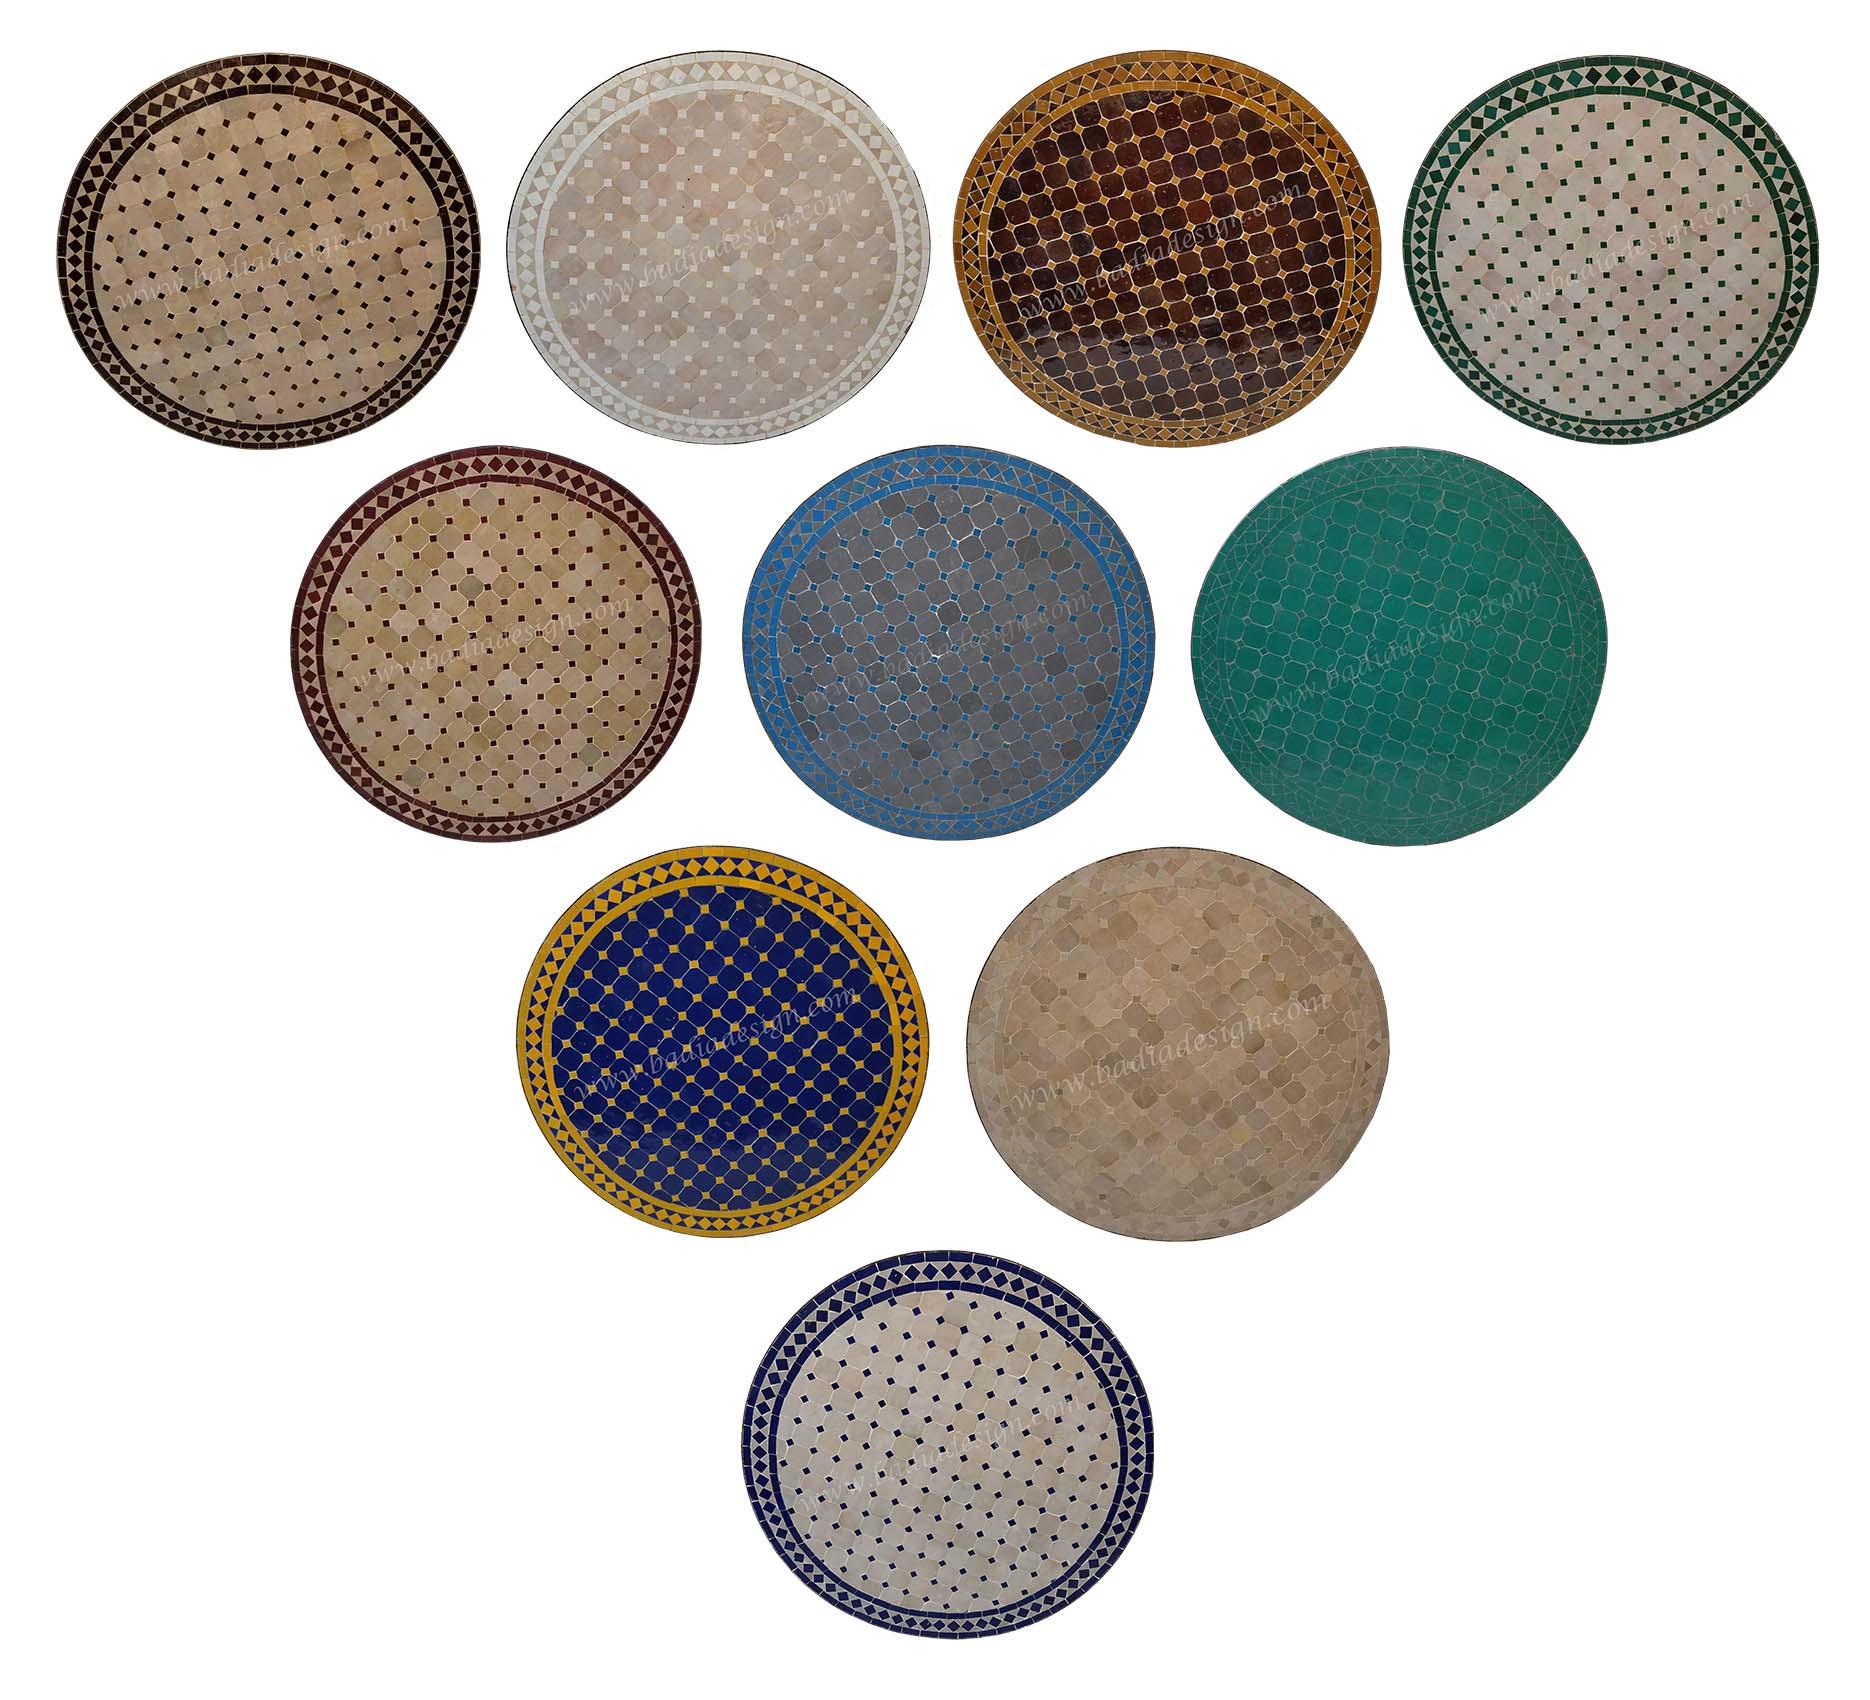 moroccan-tile-tables-los-angeles-mtr214.jpg